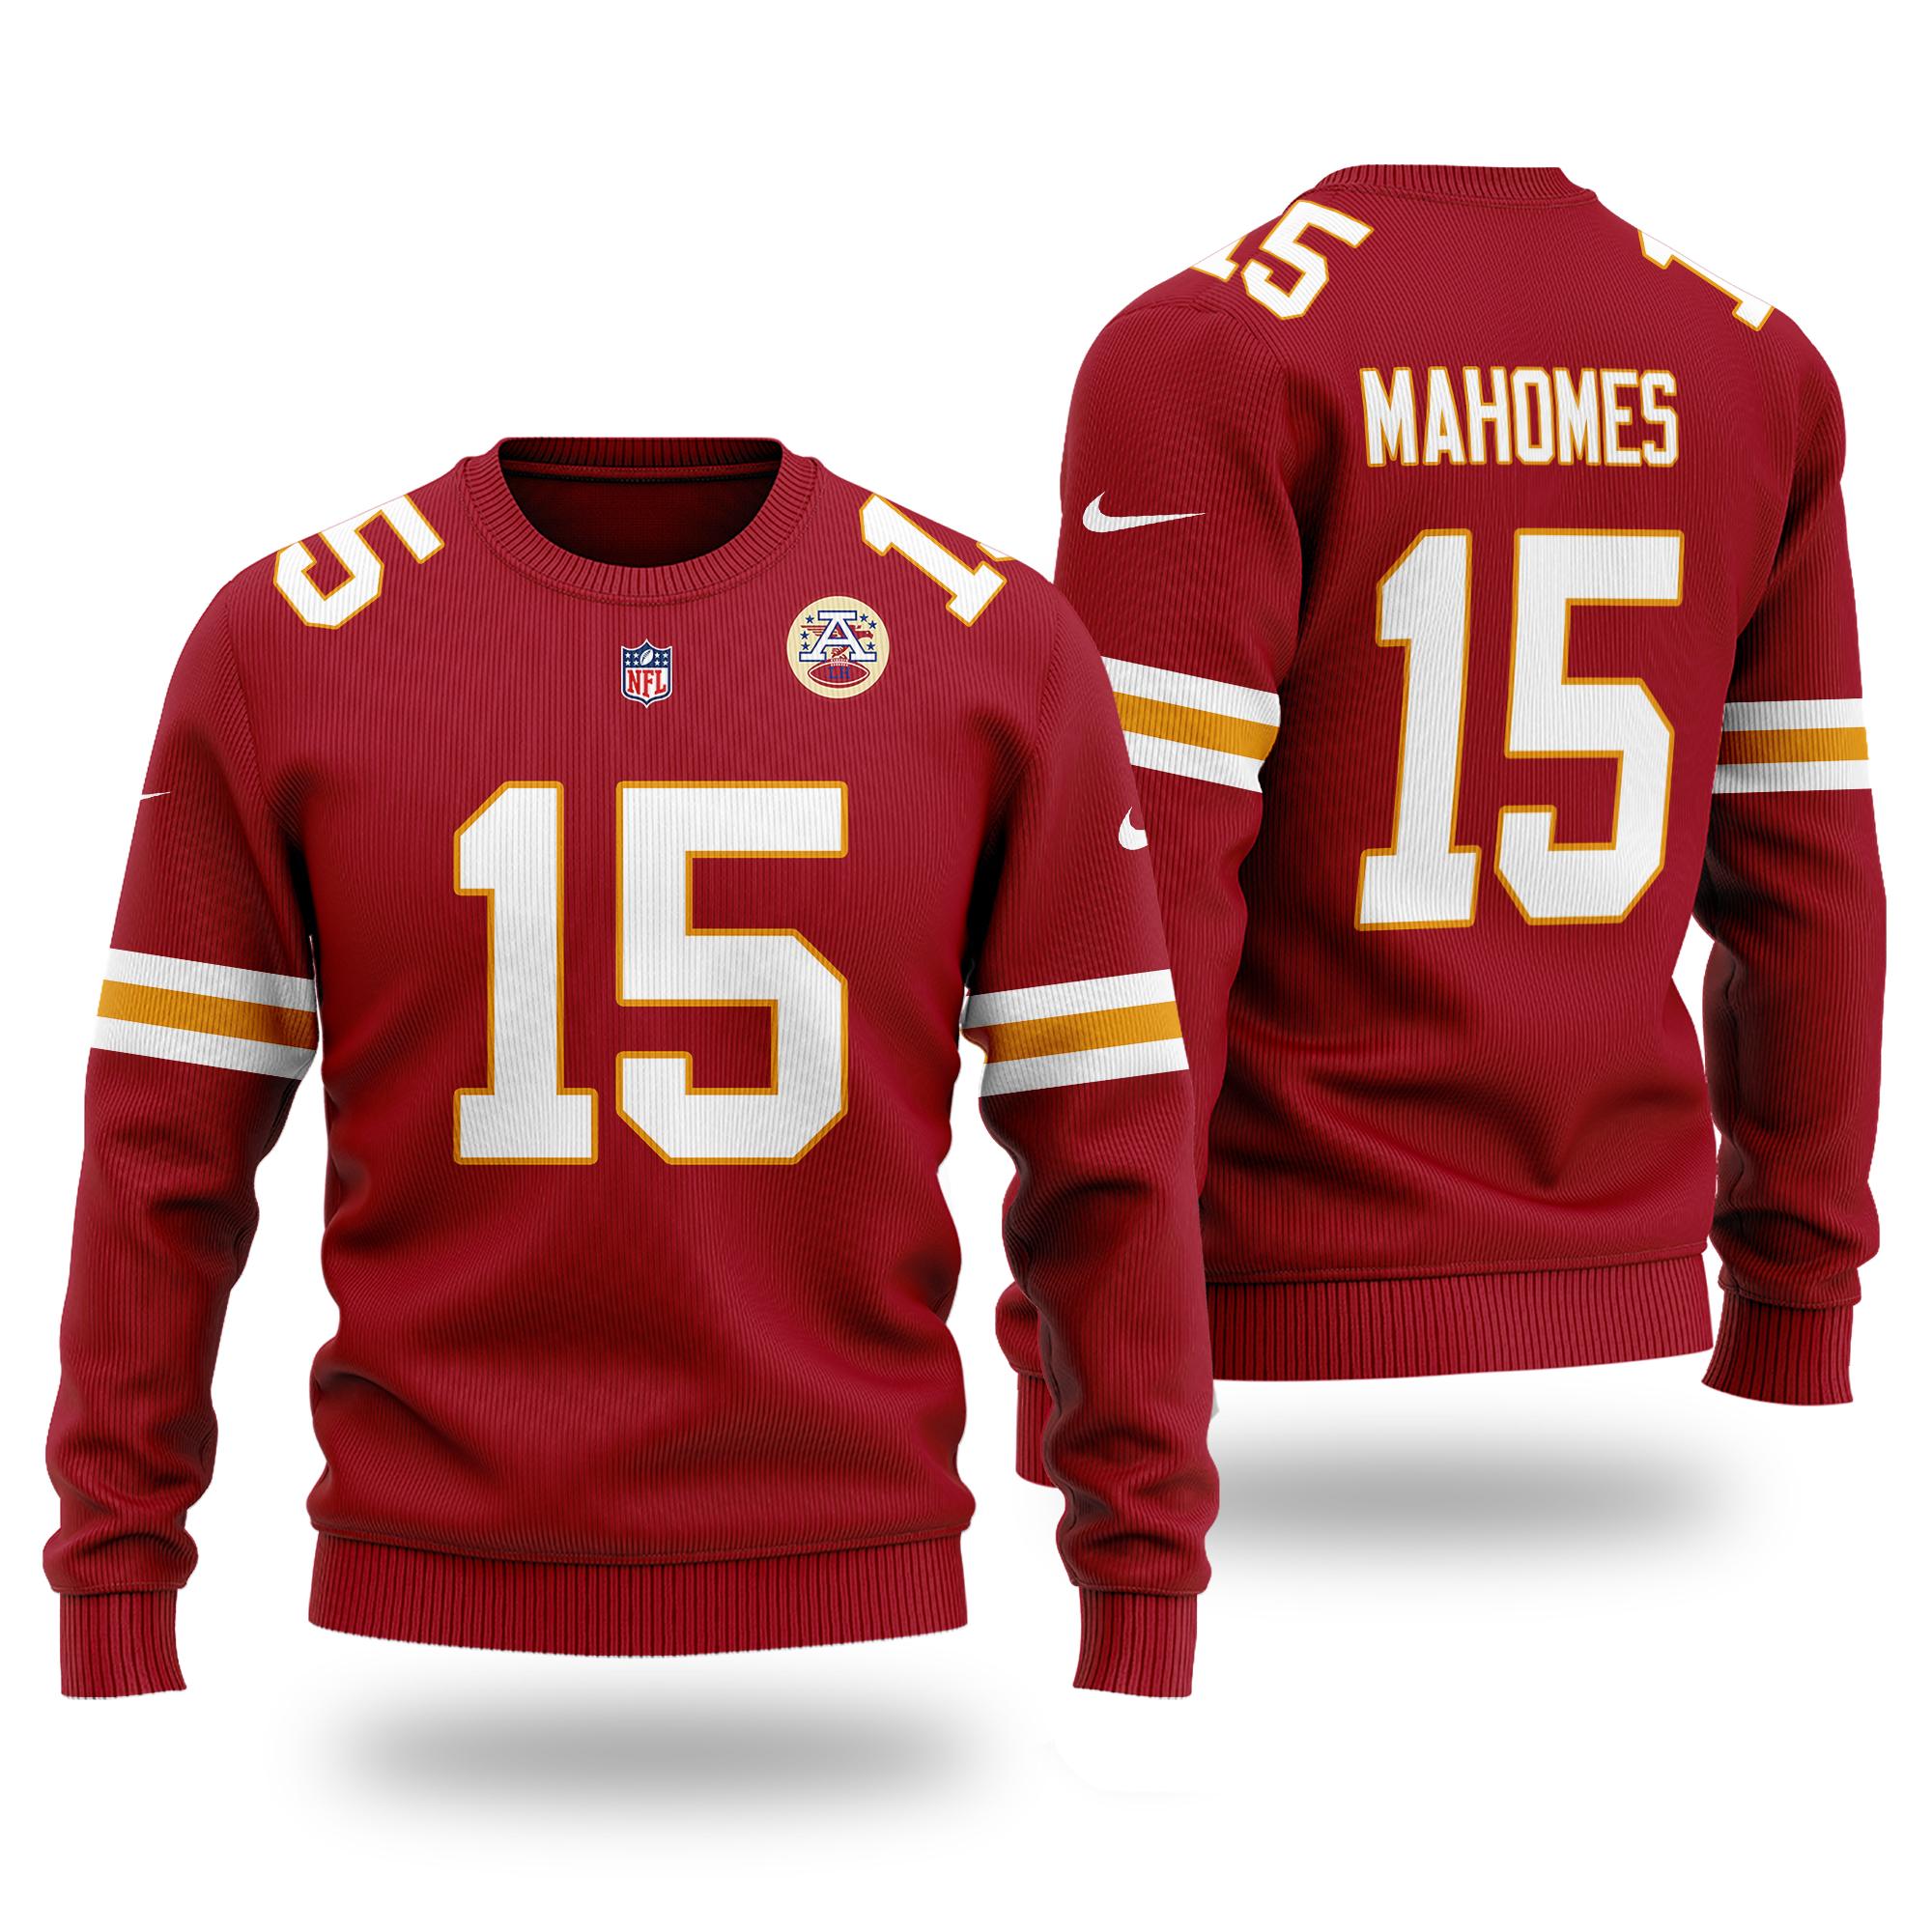 NFL KANSAS CITY CHIEFS Patrick Mahomes 15 red Sweater